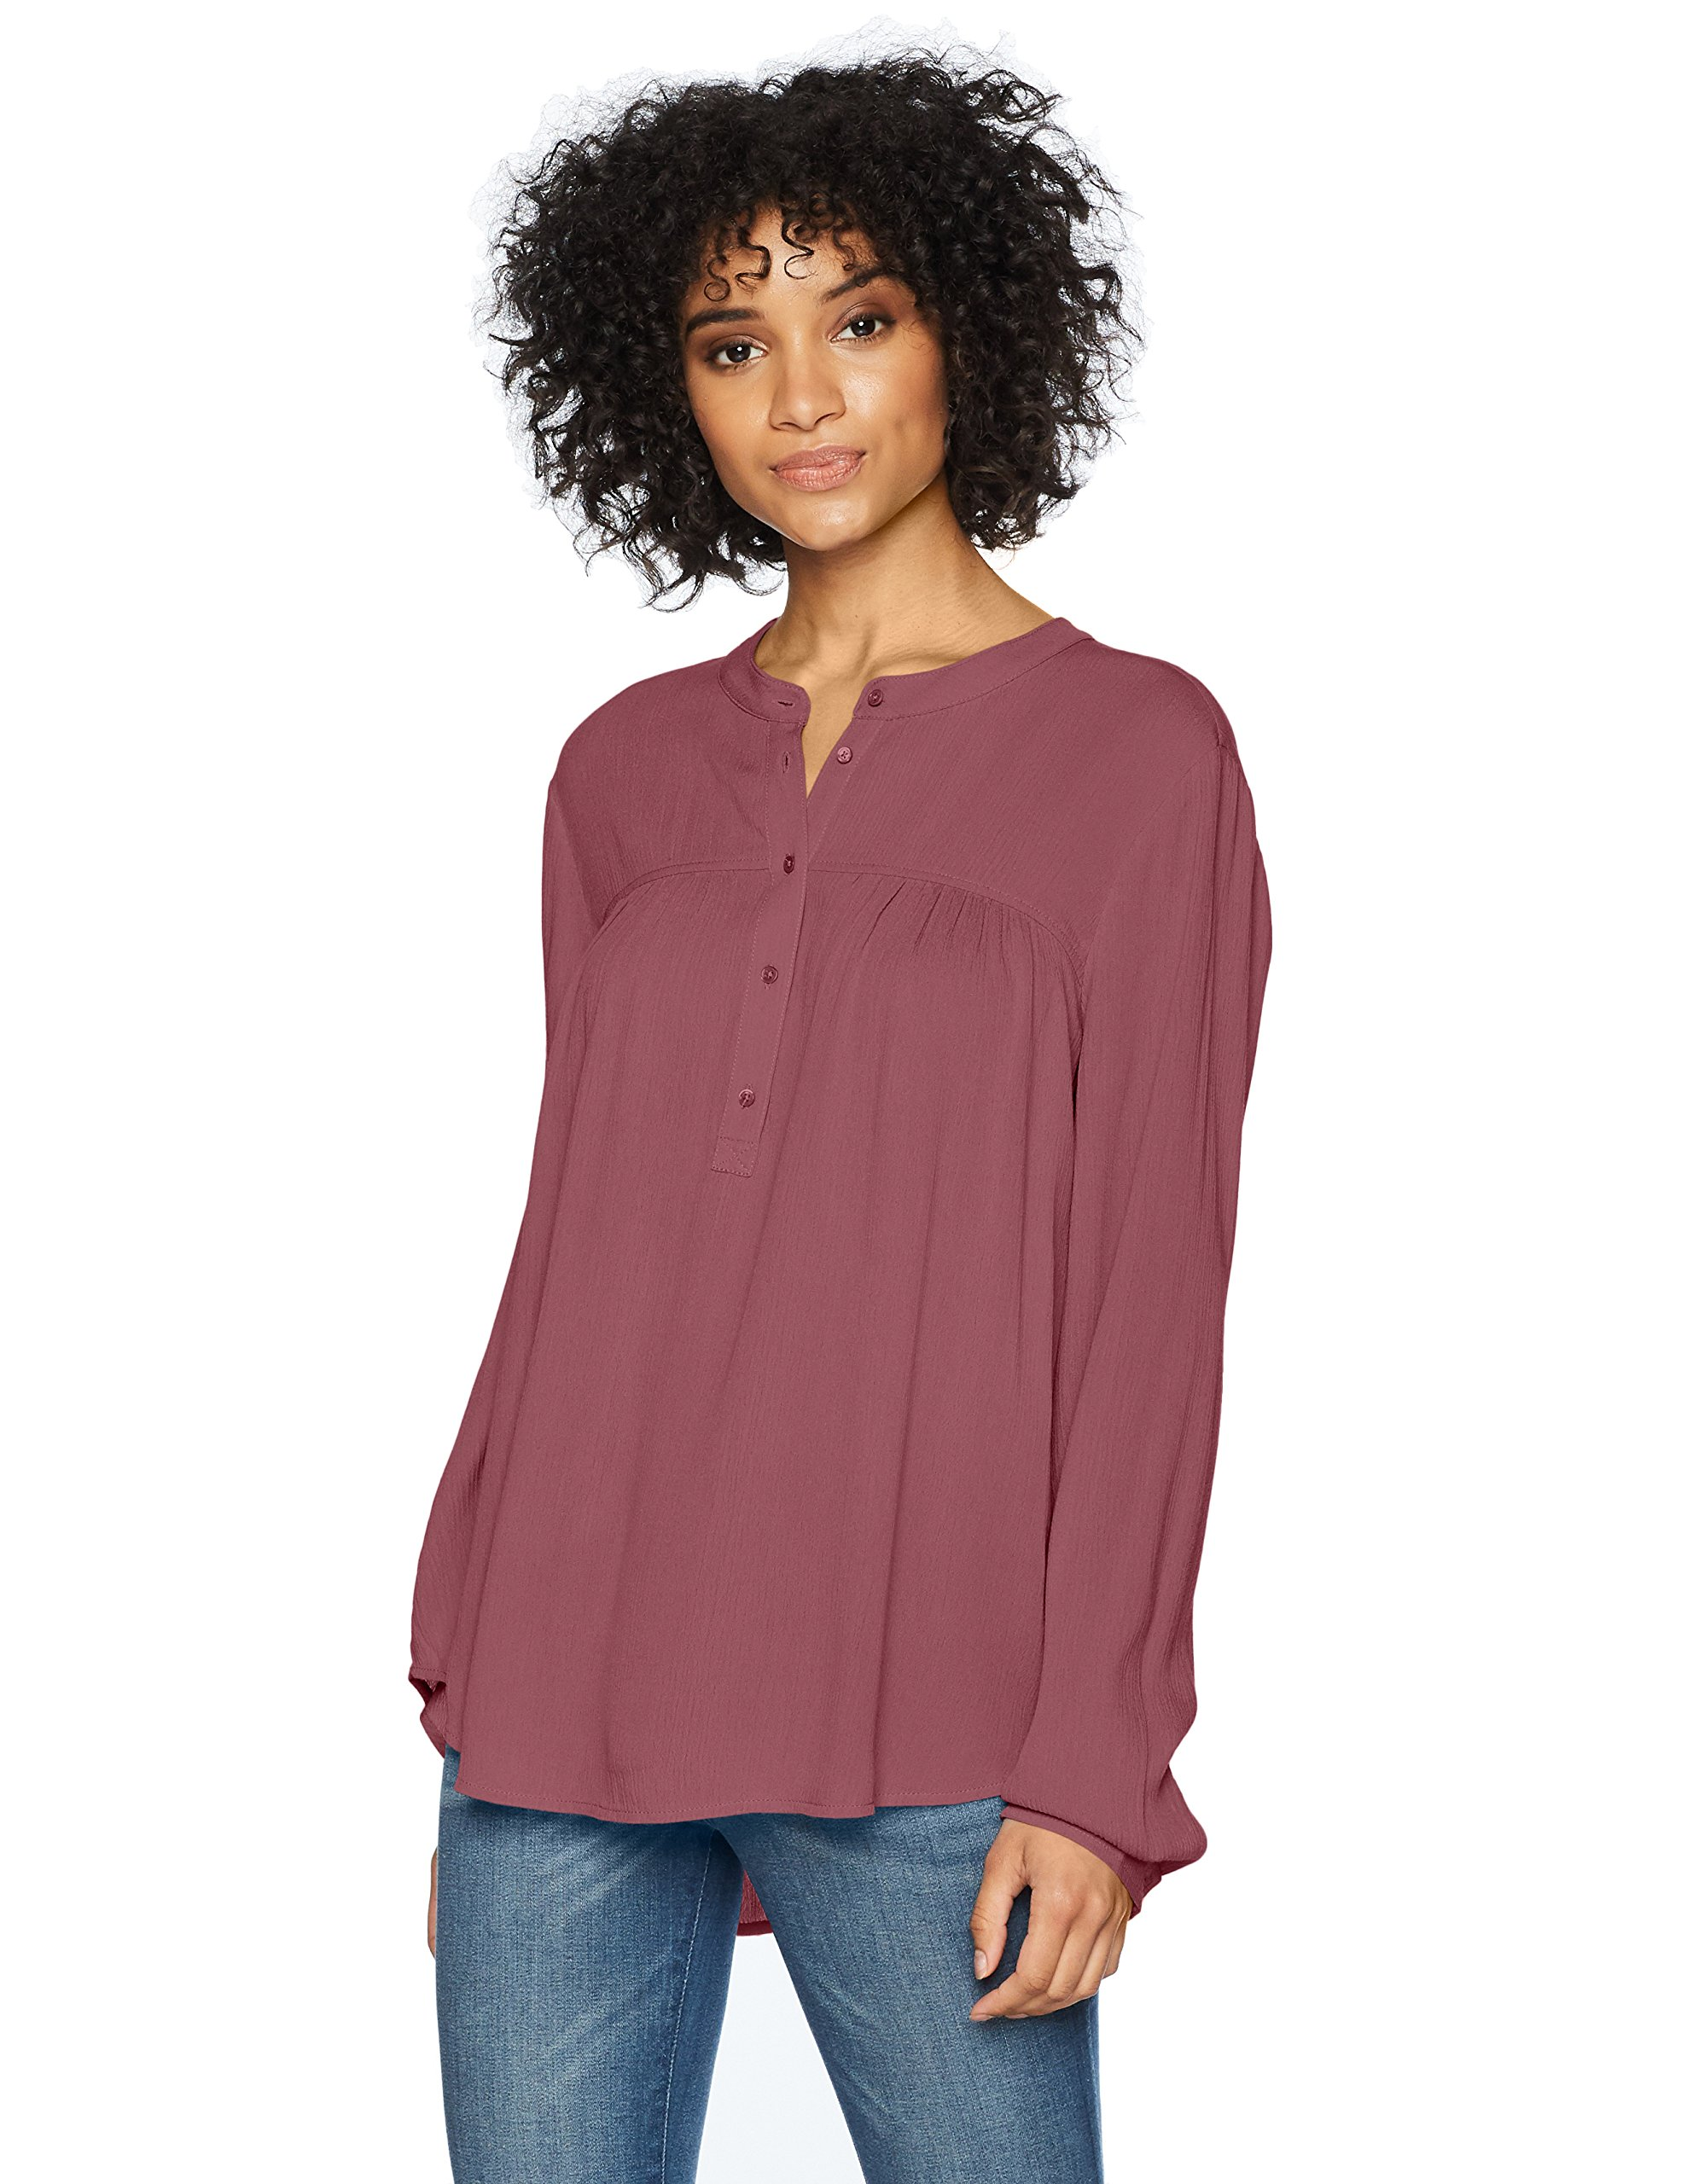 AG Adriano Goldschmied Women's Jess Shirt, Mellow Fig, L